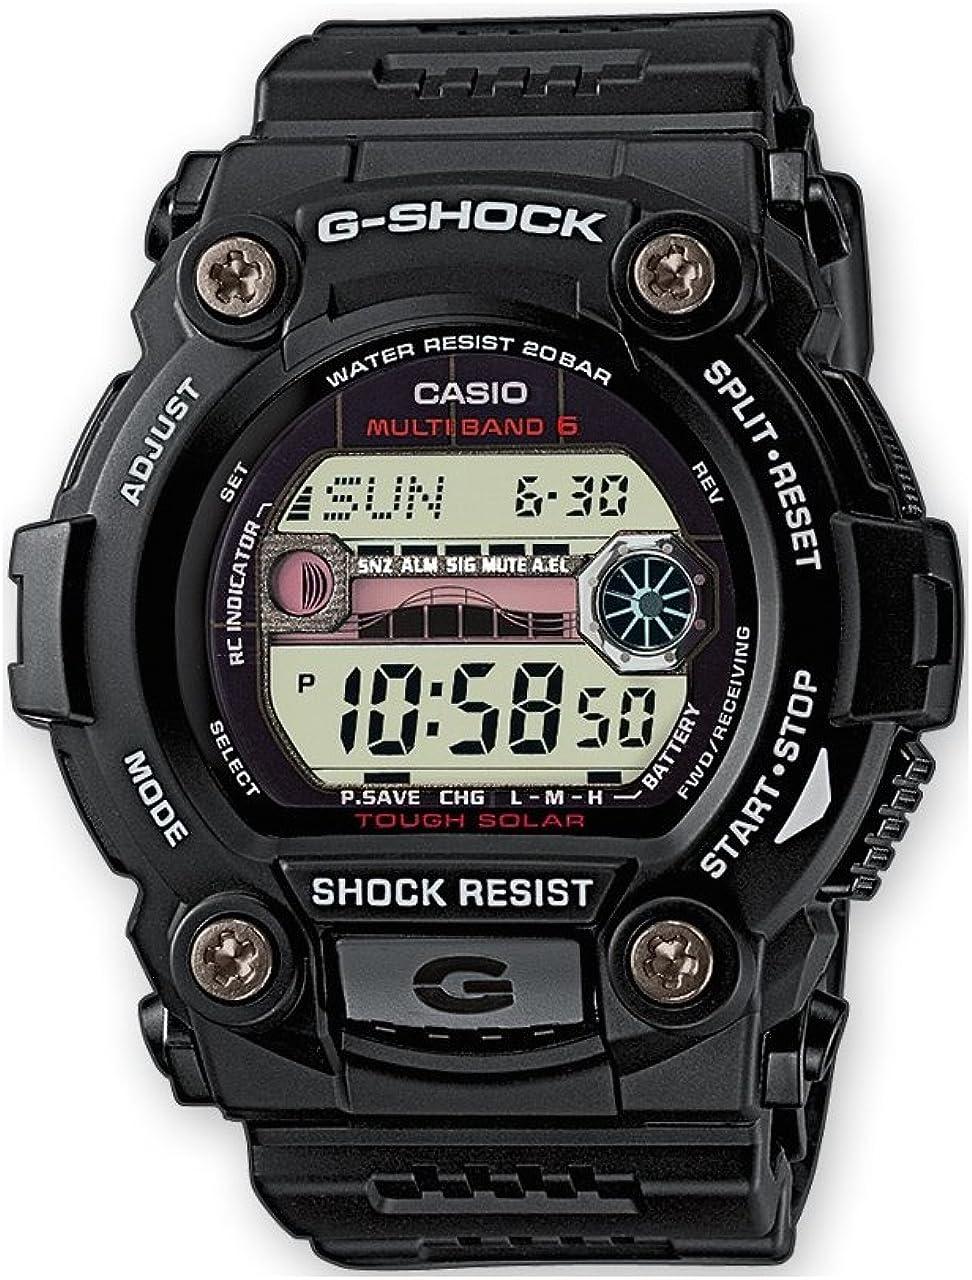 Casio G-SHOCK Reloj Digital, Reloj radiocontrolado y solar, 20 BAR, Negro, para Hombre, GW-7900-1ER